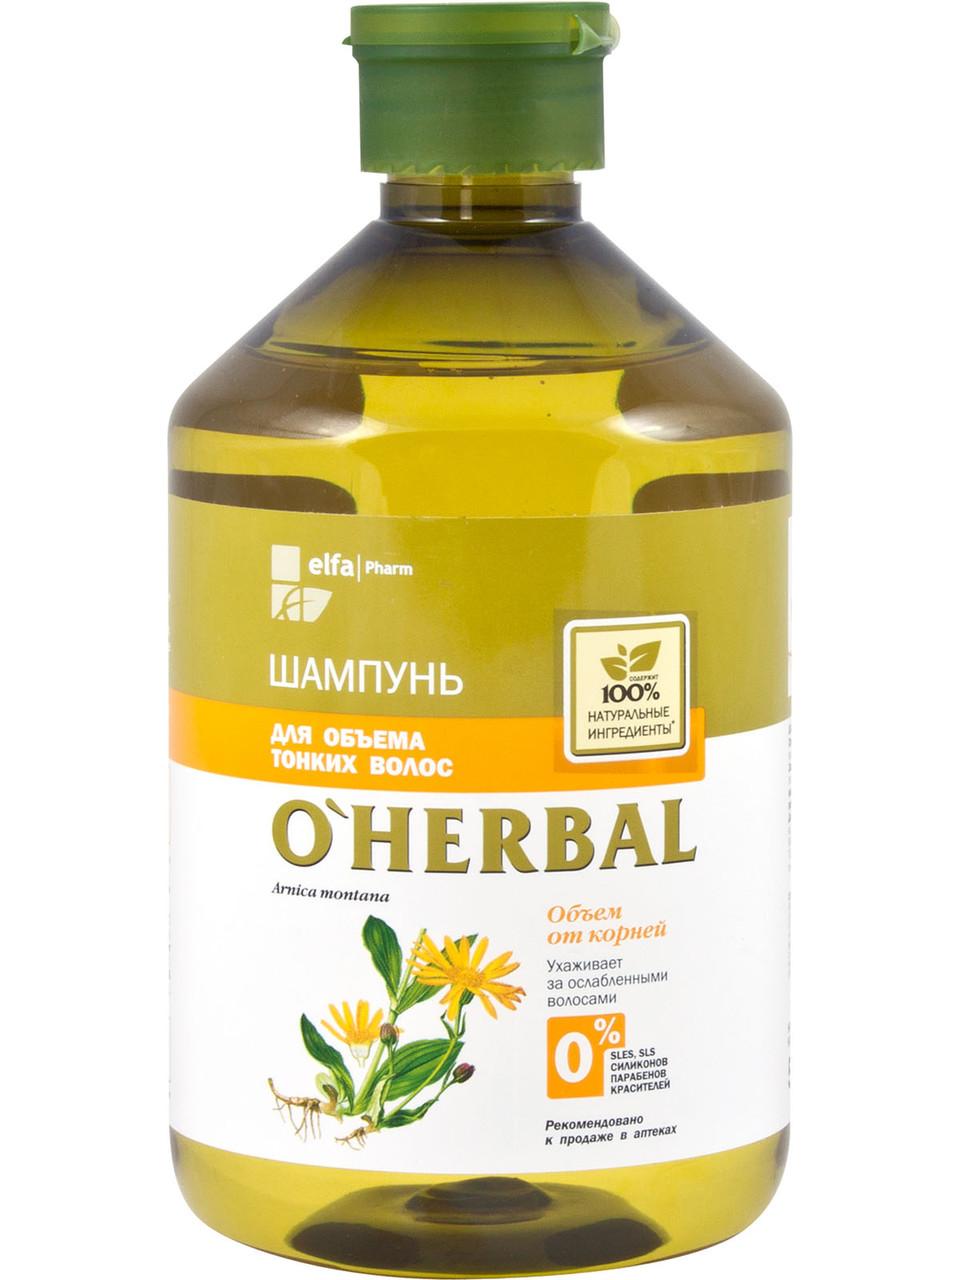 O'Herbal Шампунь для объема тонких волос 500мл